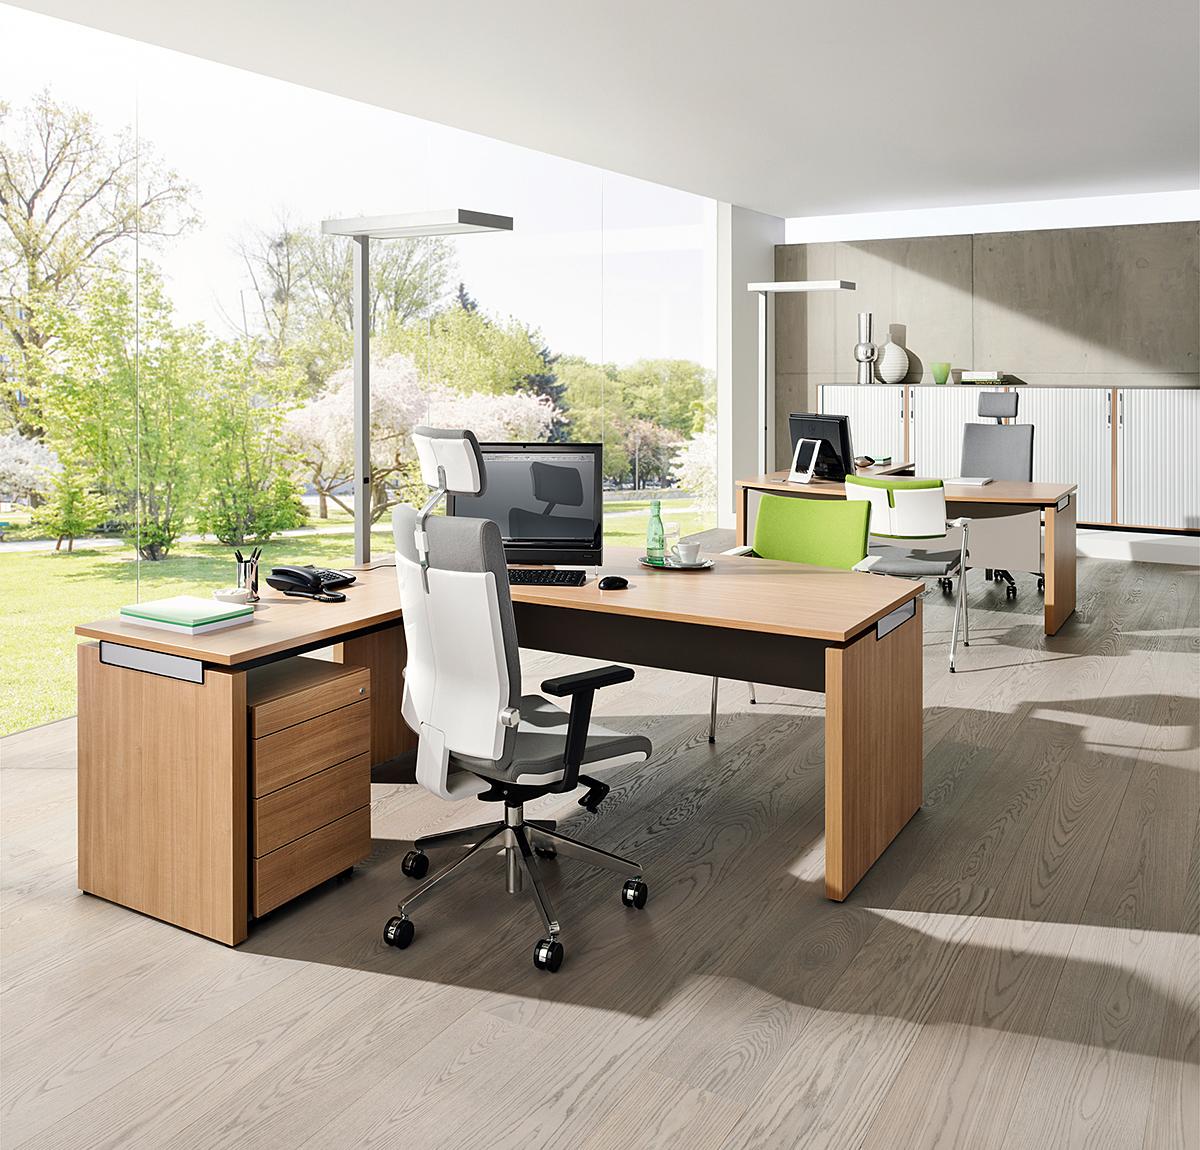 Nowoczesne meble gabinetowe SQart MANAGERIAL do biura i gabinetu, biurka do gabinetu